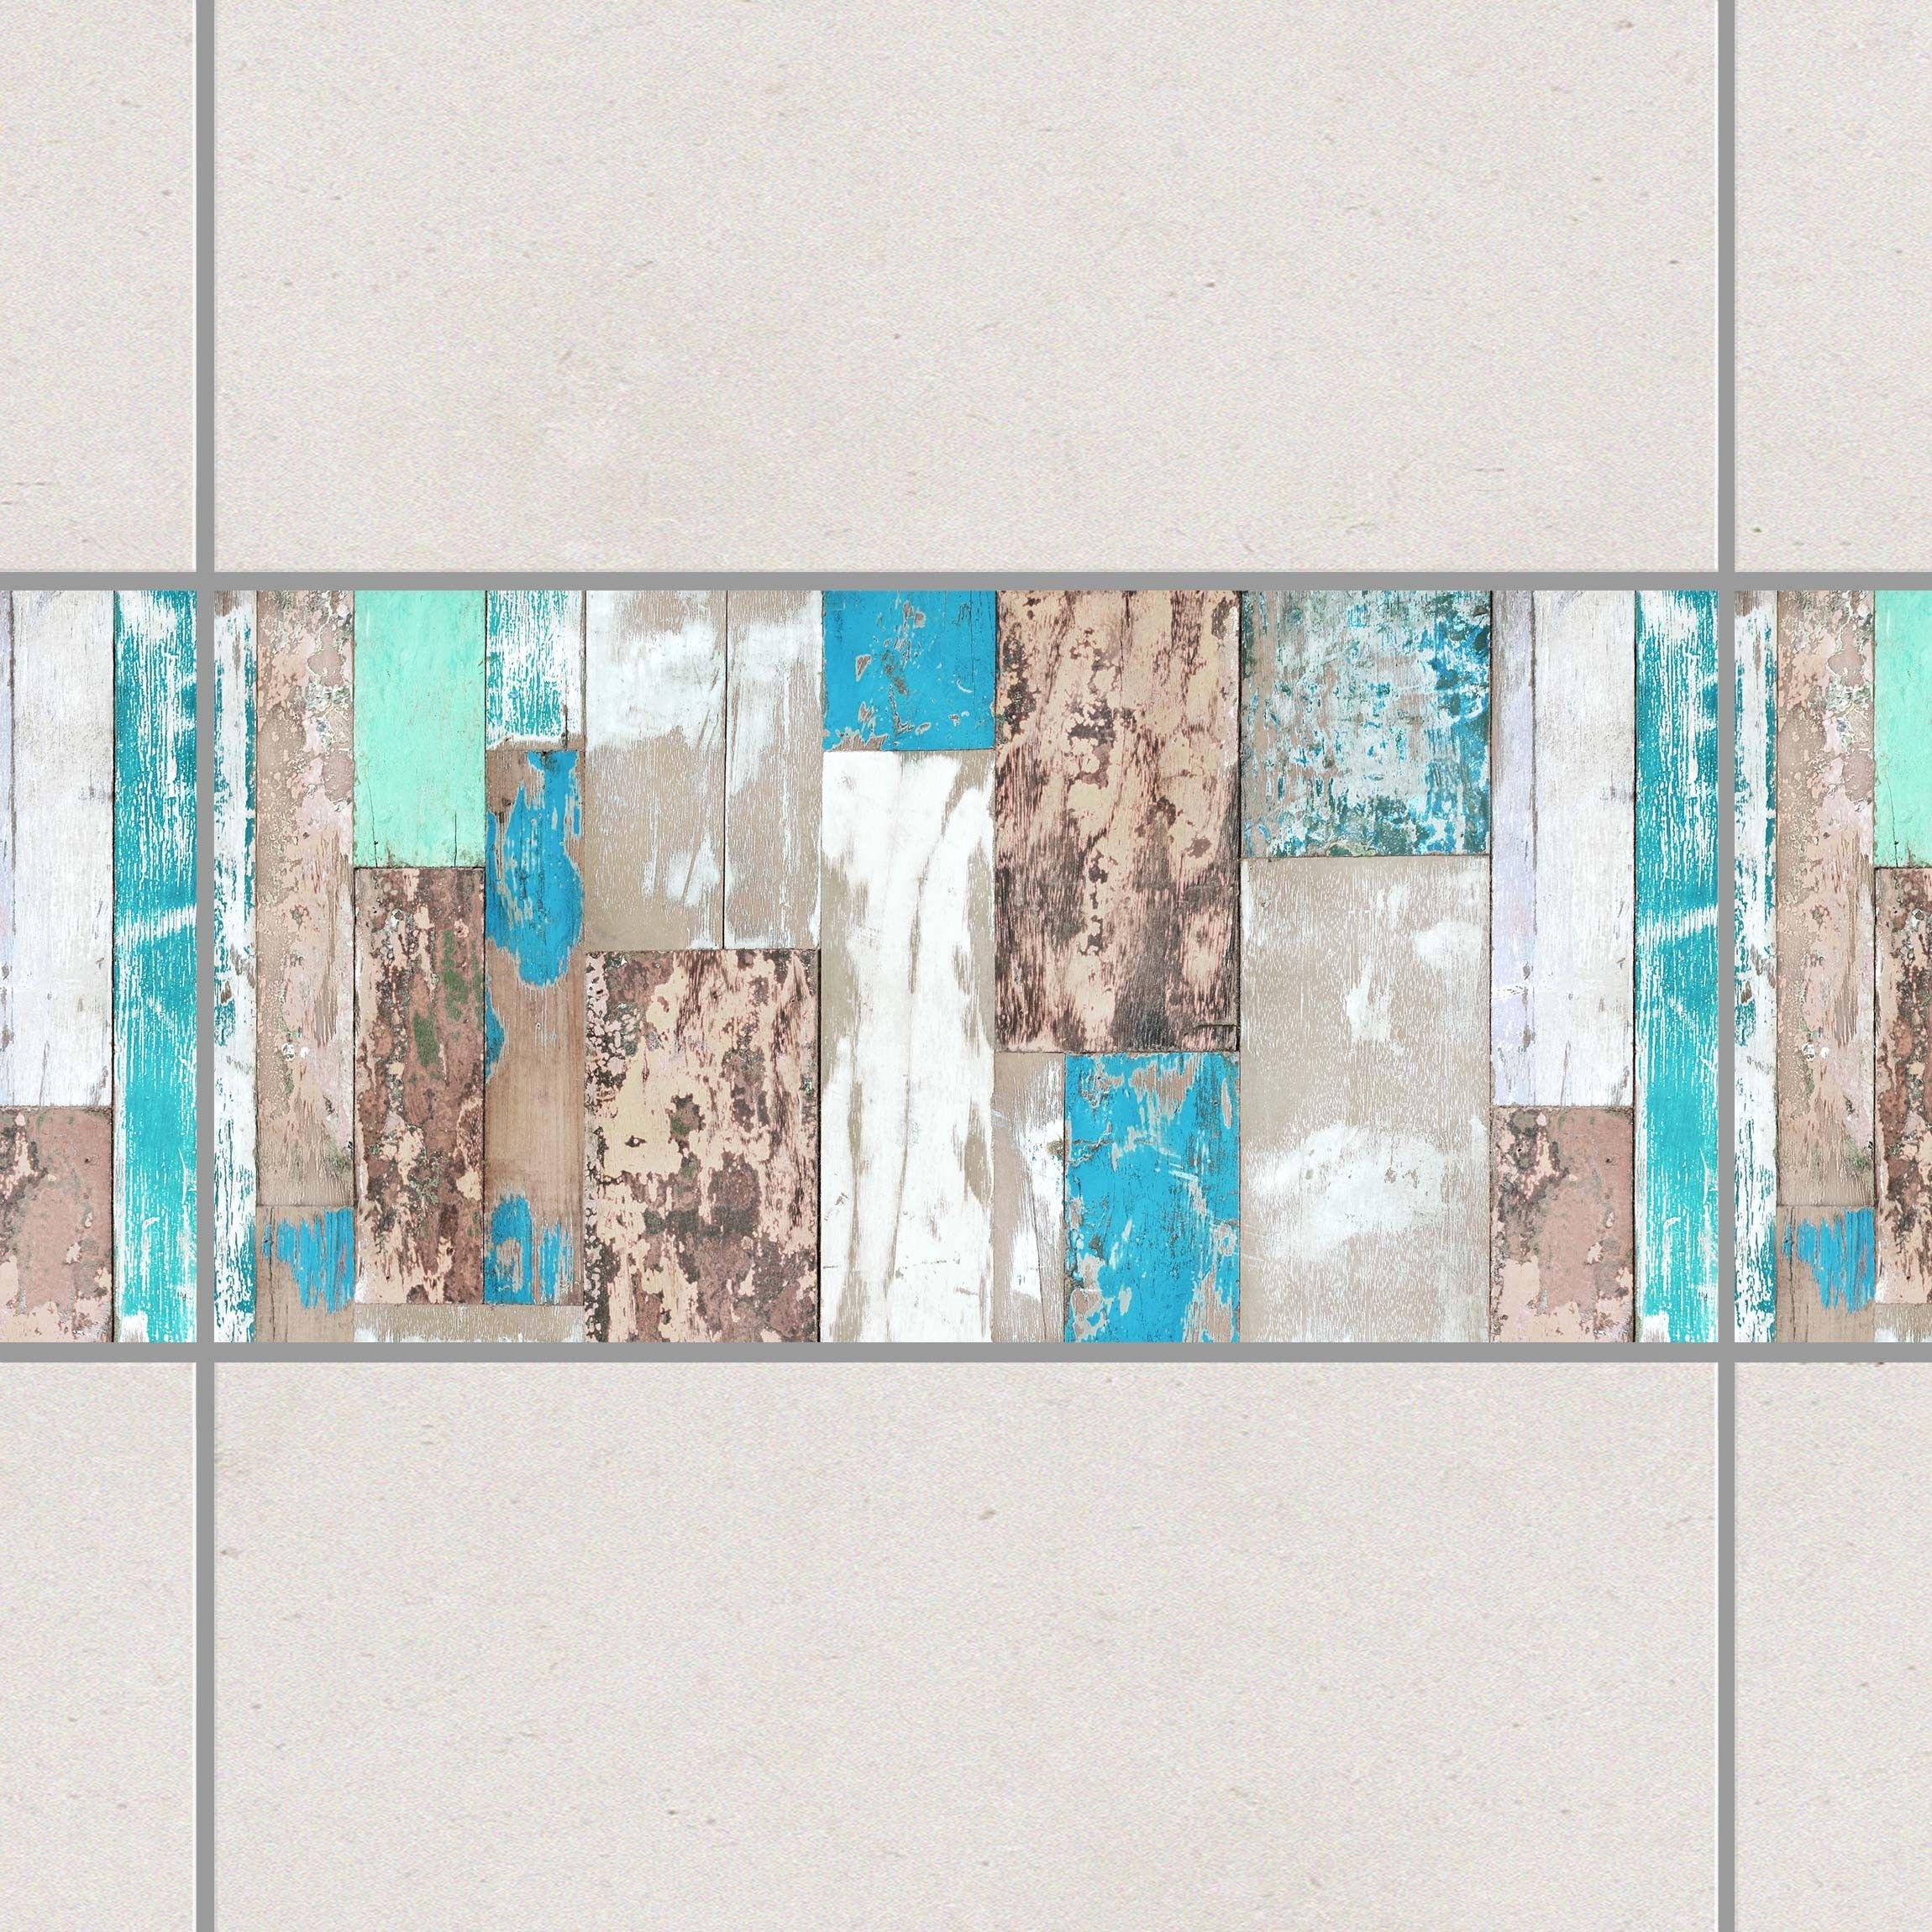 Fliesenaufkleber Maritime Planks 25x20 Cm Fliesensticker Set Fliesenaufkleber Fliesen Aufkleber